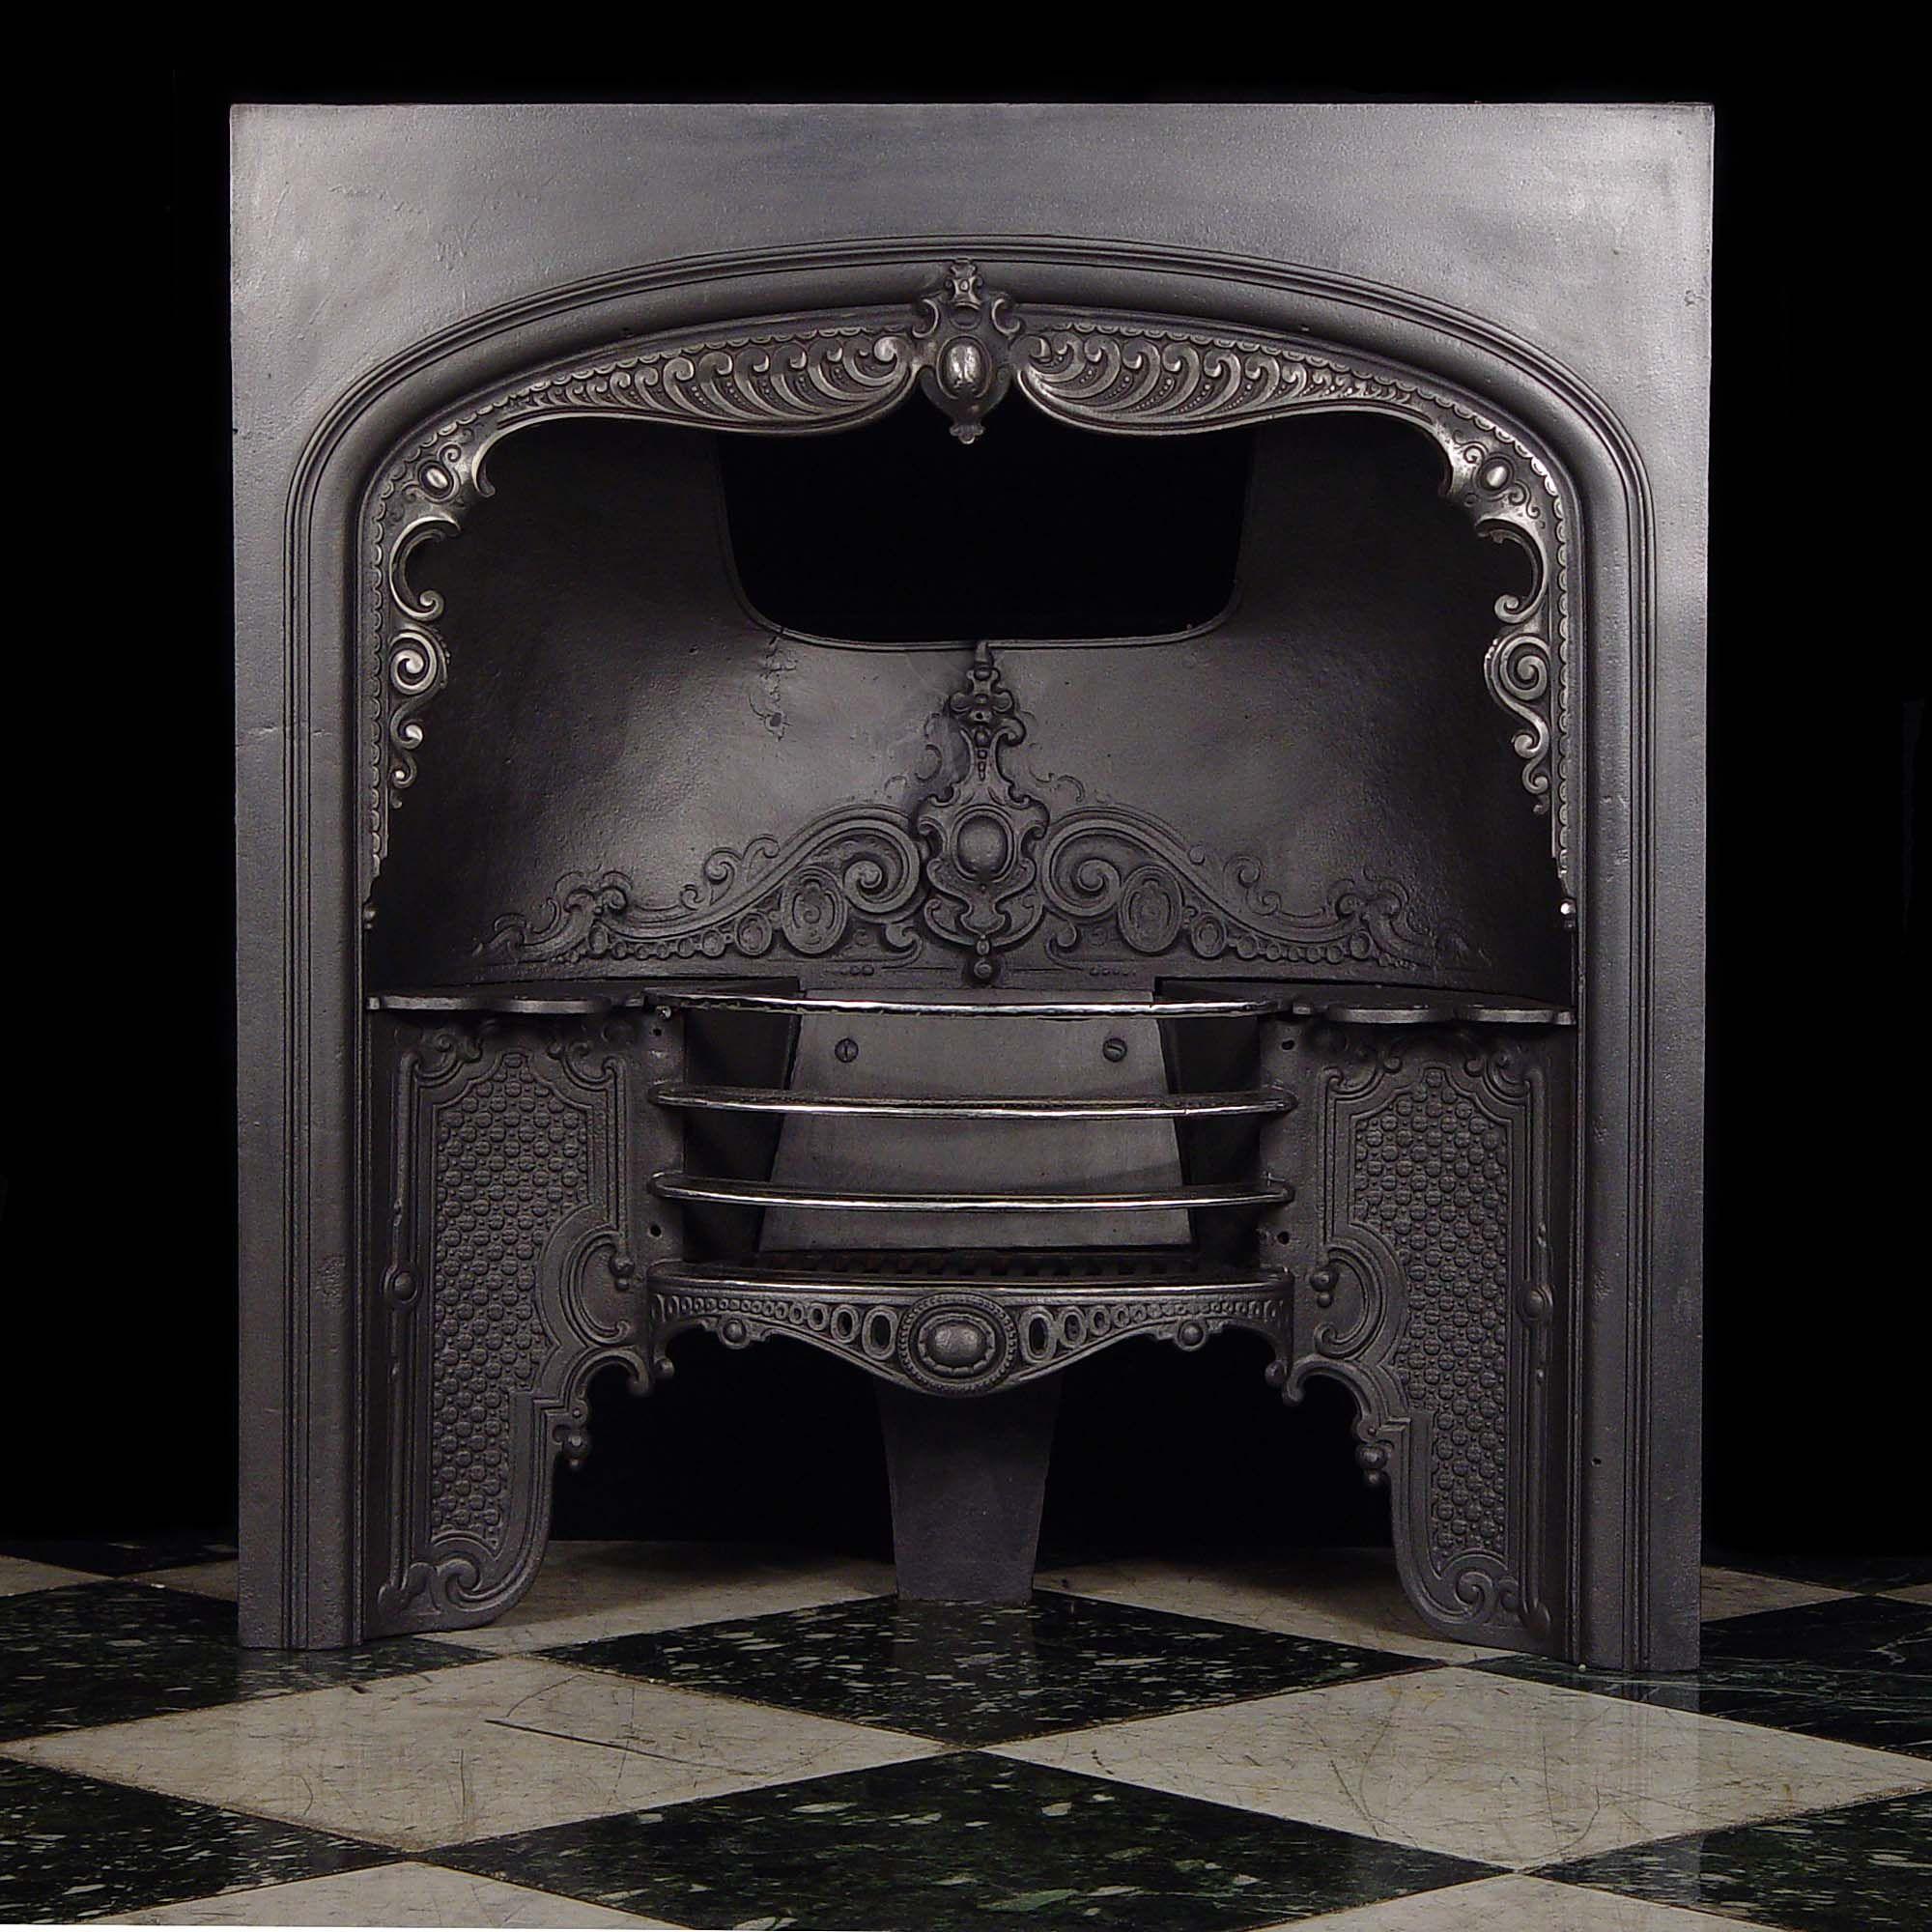 Decorative Grates Registers A Pretty And Decorative Cast Iron Mid Victorian Register Grate